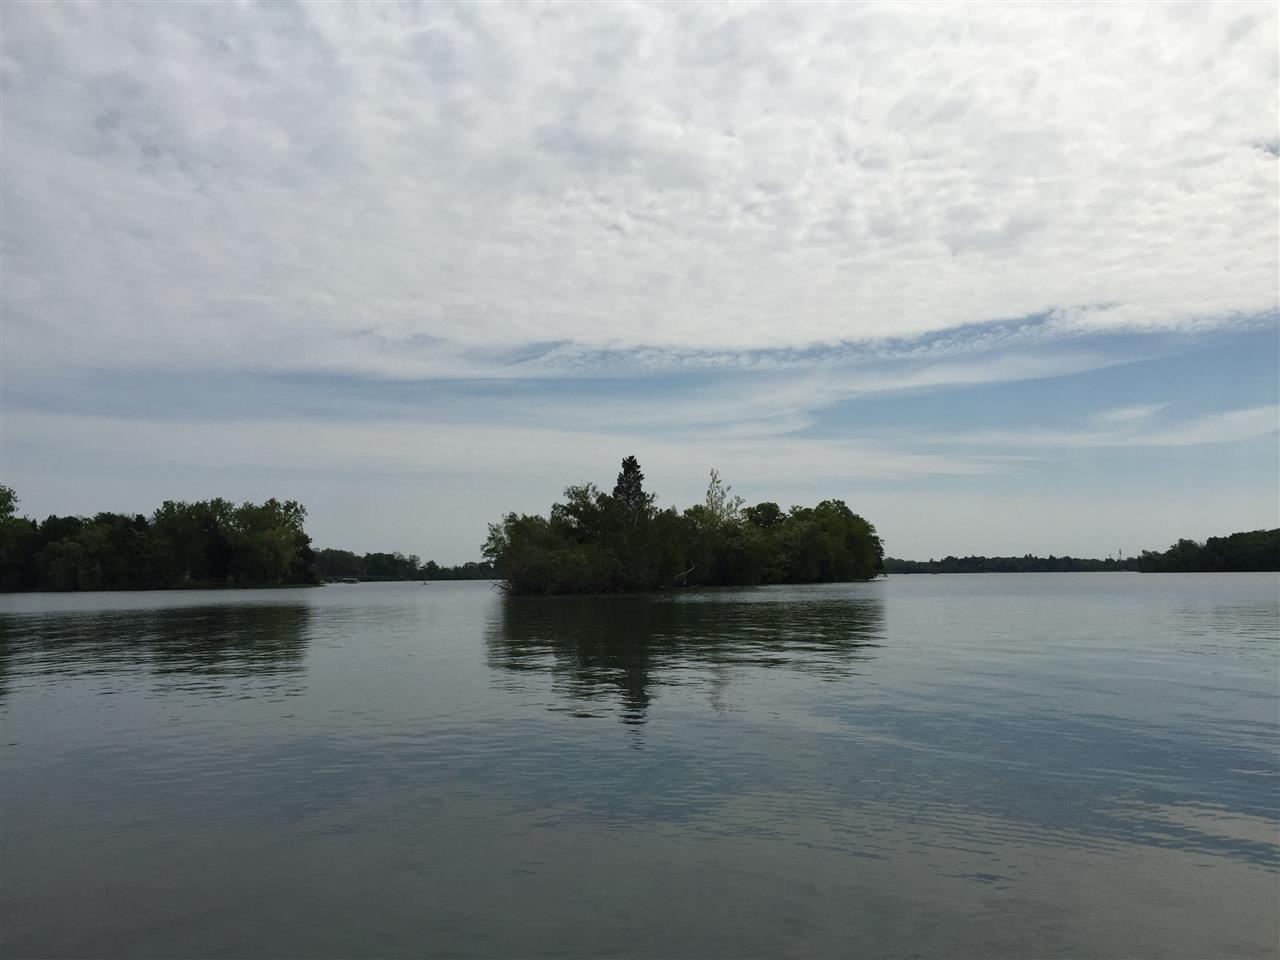 Orchard Lake and Cedar Island view. Orchard Lake, Michigan #LeadingRElocal #OrchardLake #Michigan